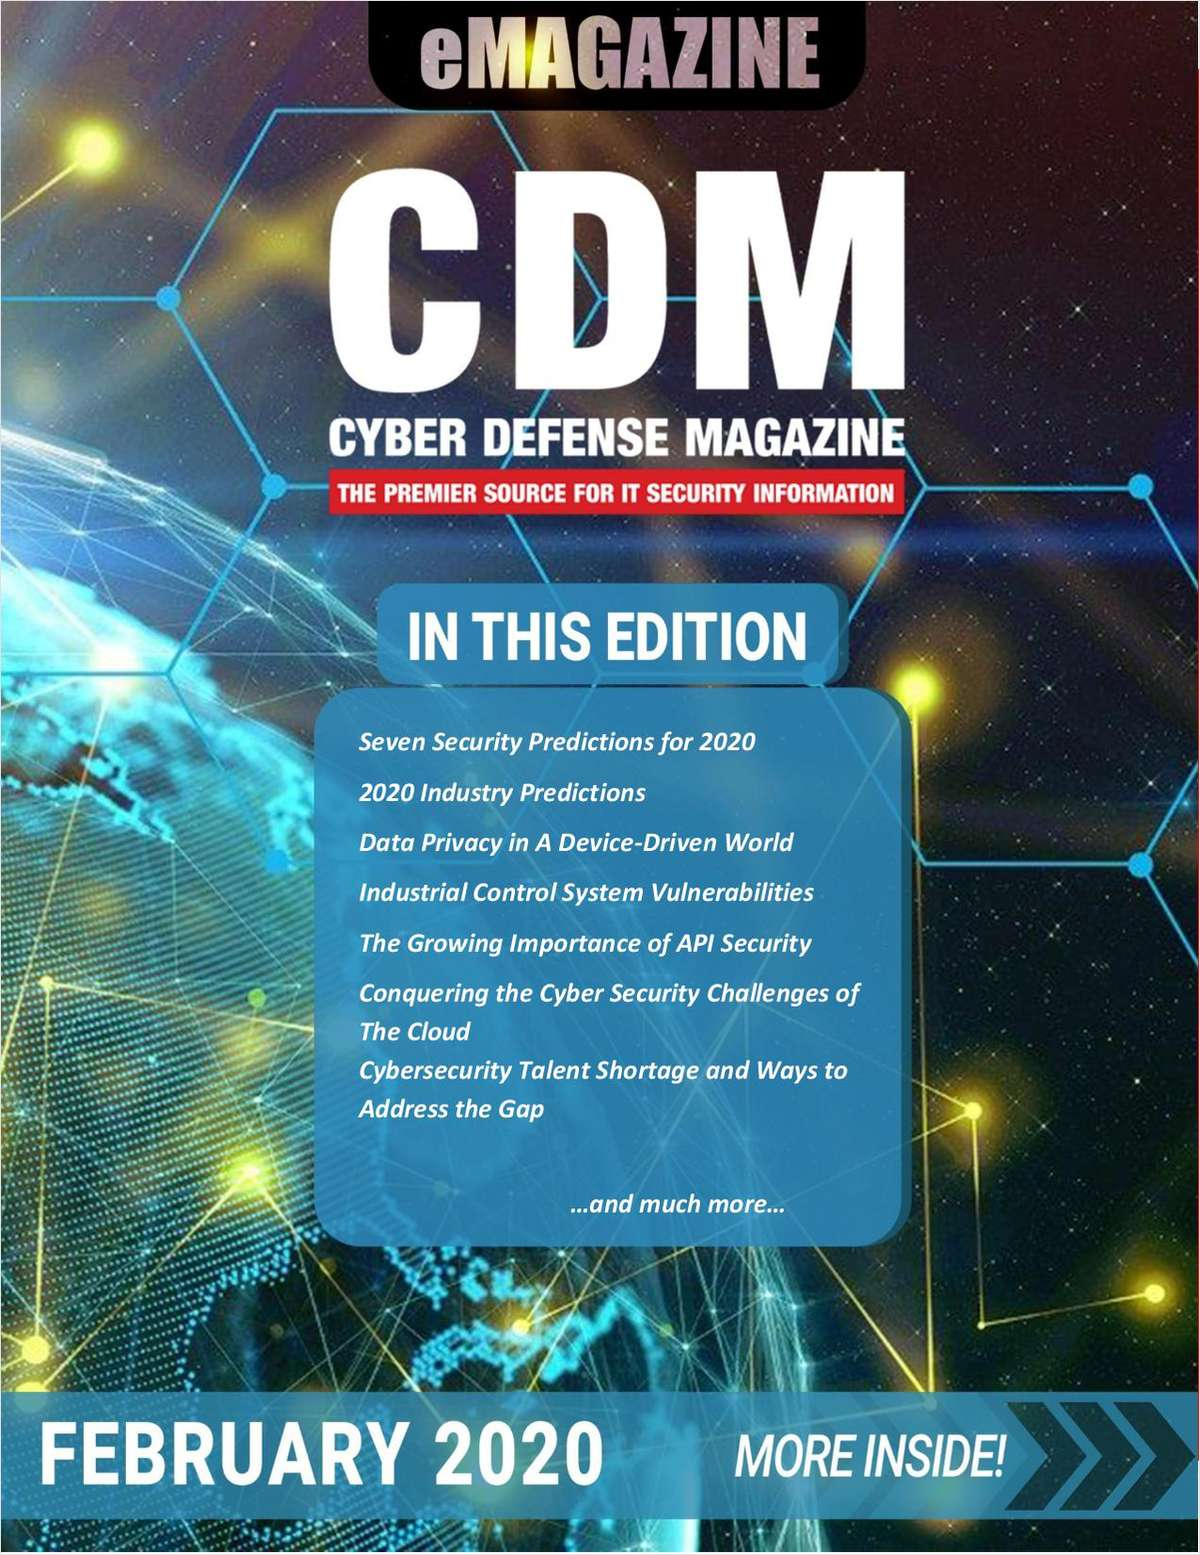 Cyber Defense Magazine February 2020